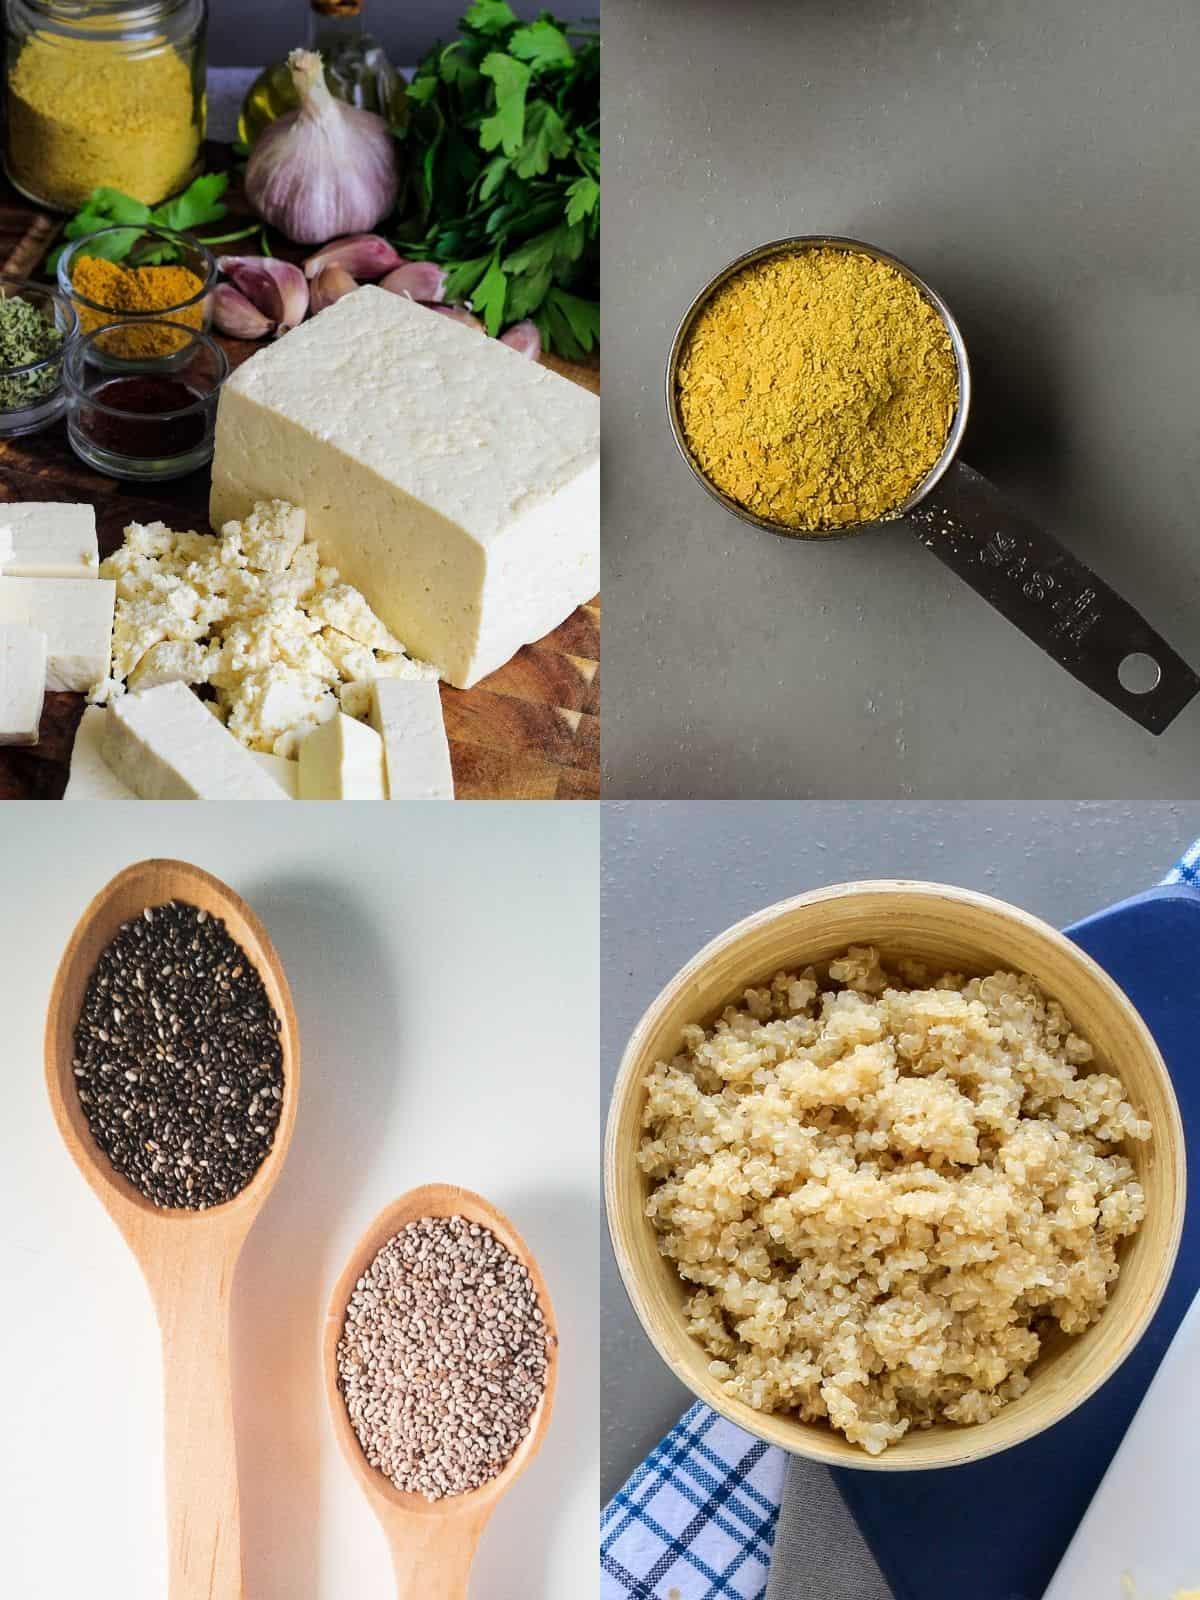 Collage of plant based breakfast ingredients